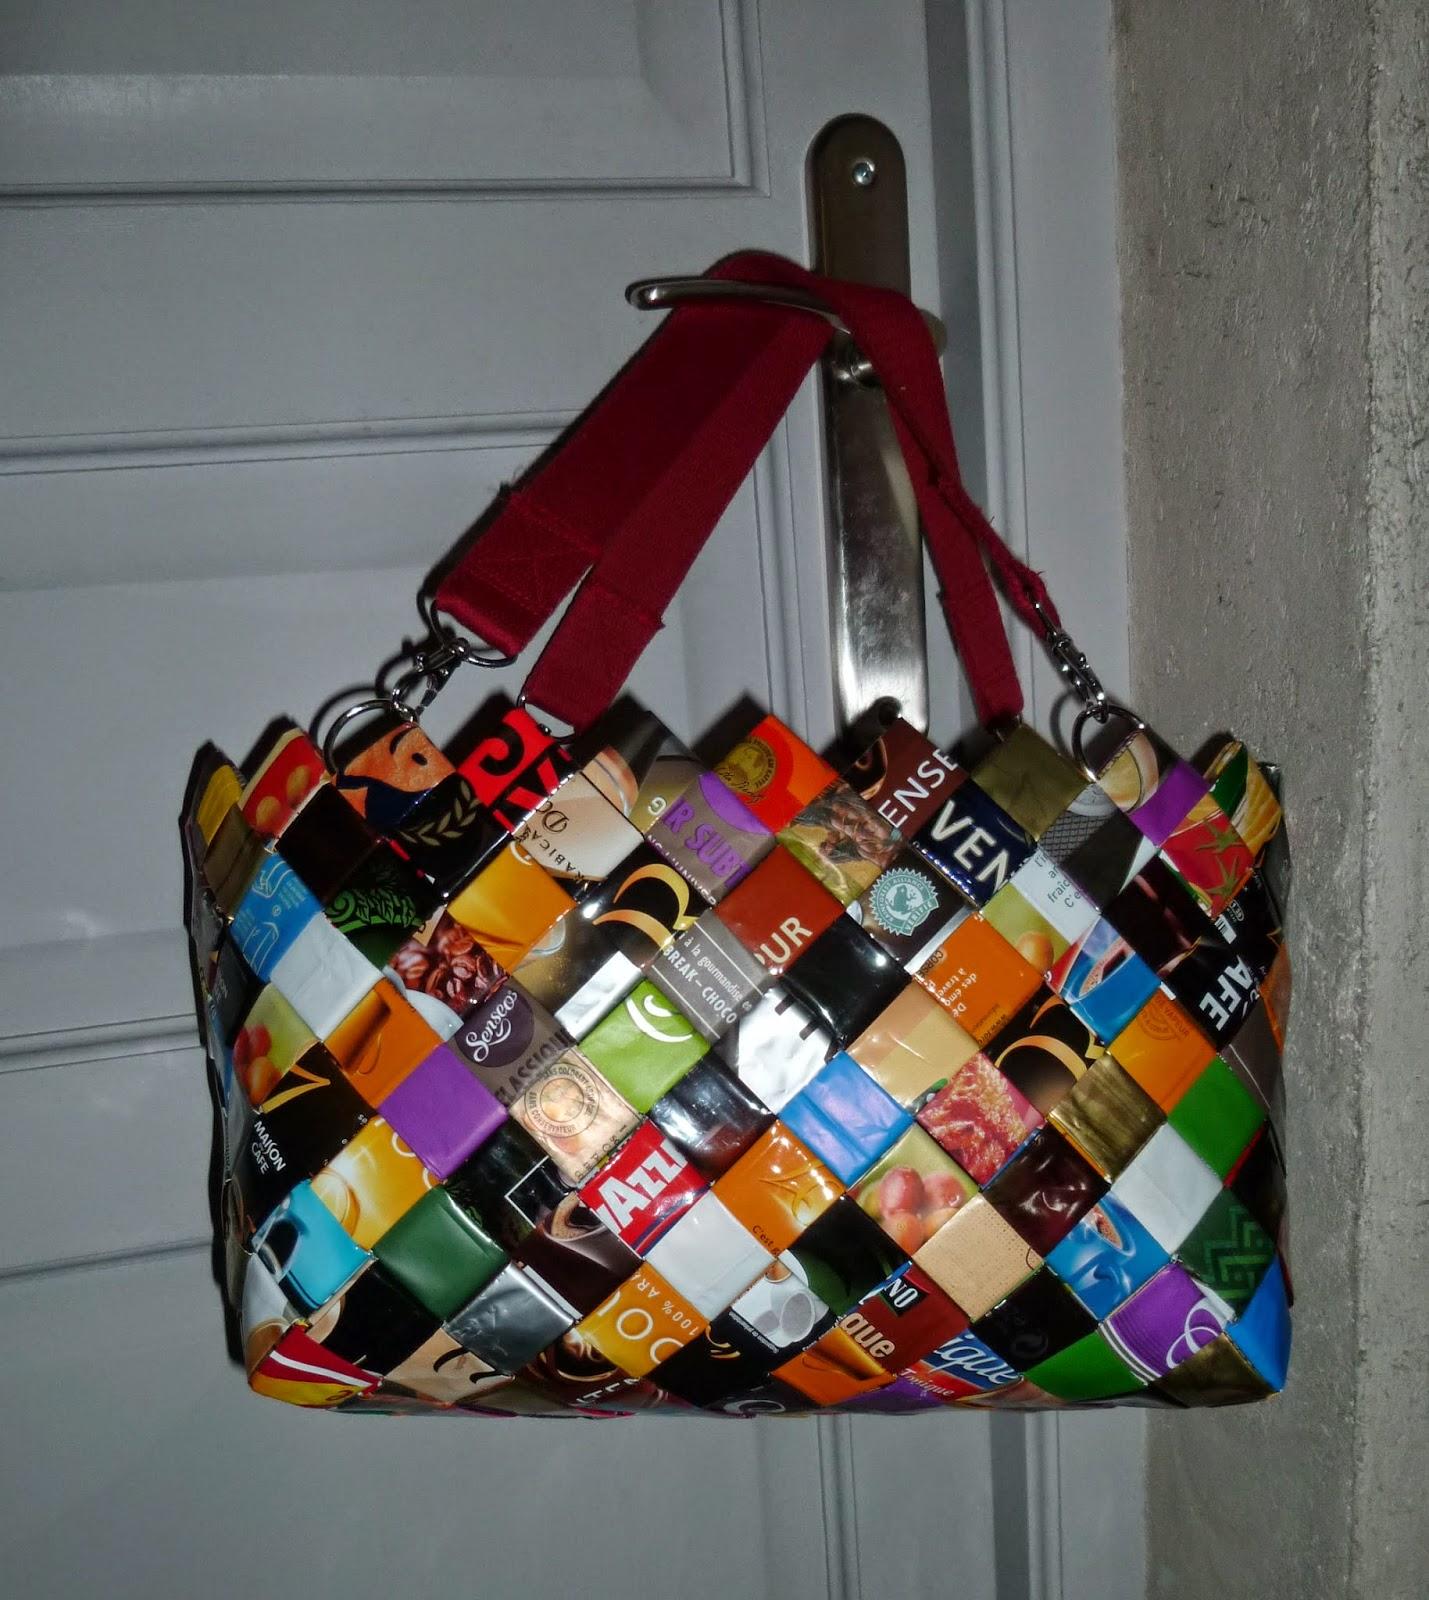 longchamp bricole sac cabas color avec des emballages de r cup caf chips. Black Bedroom Furniture Sets. Home Design Ideas